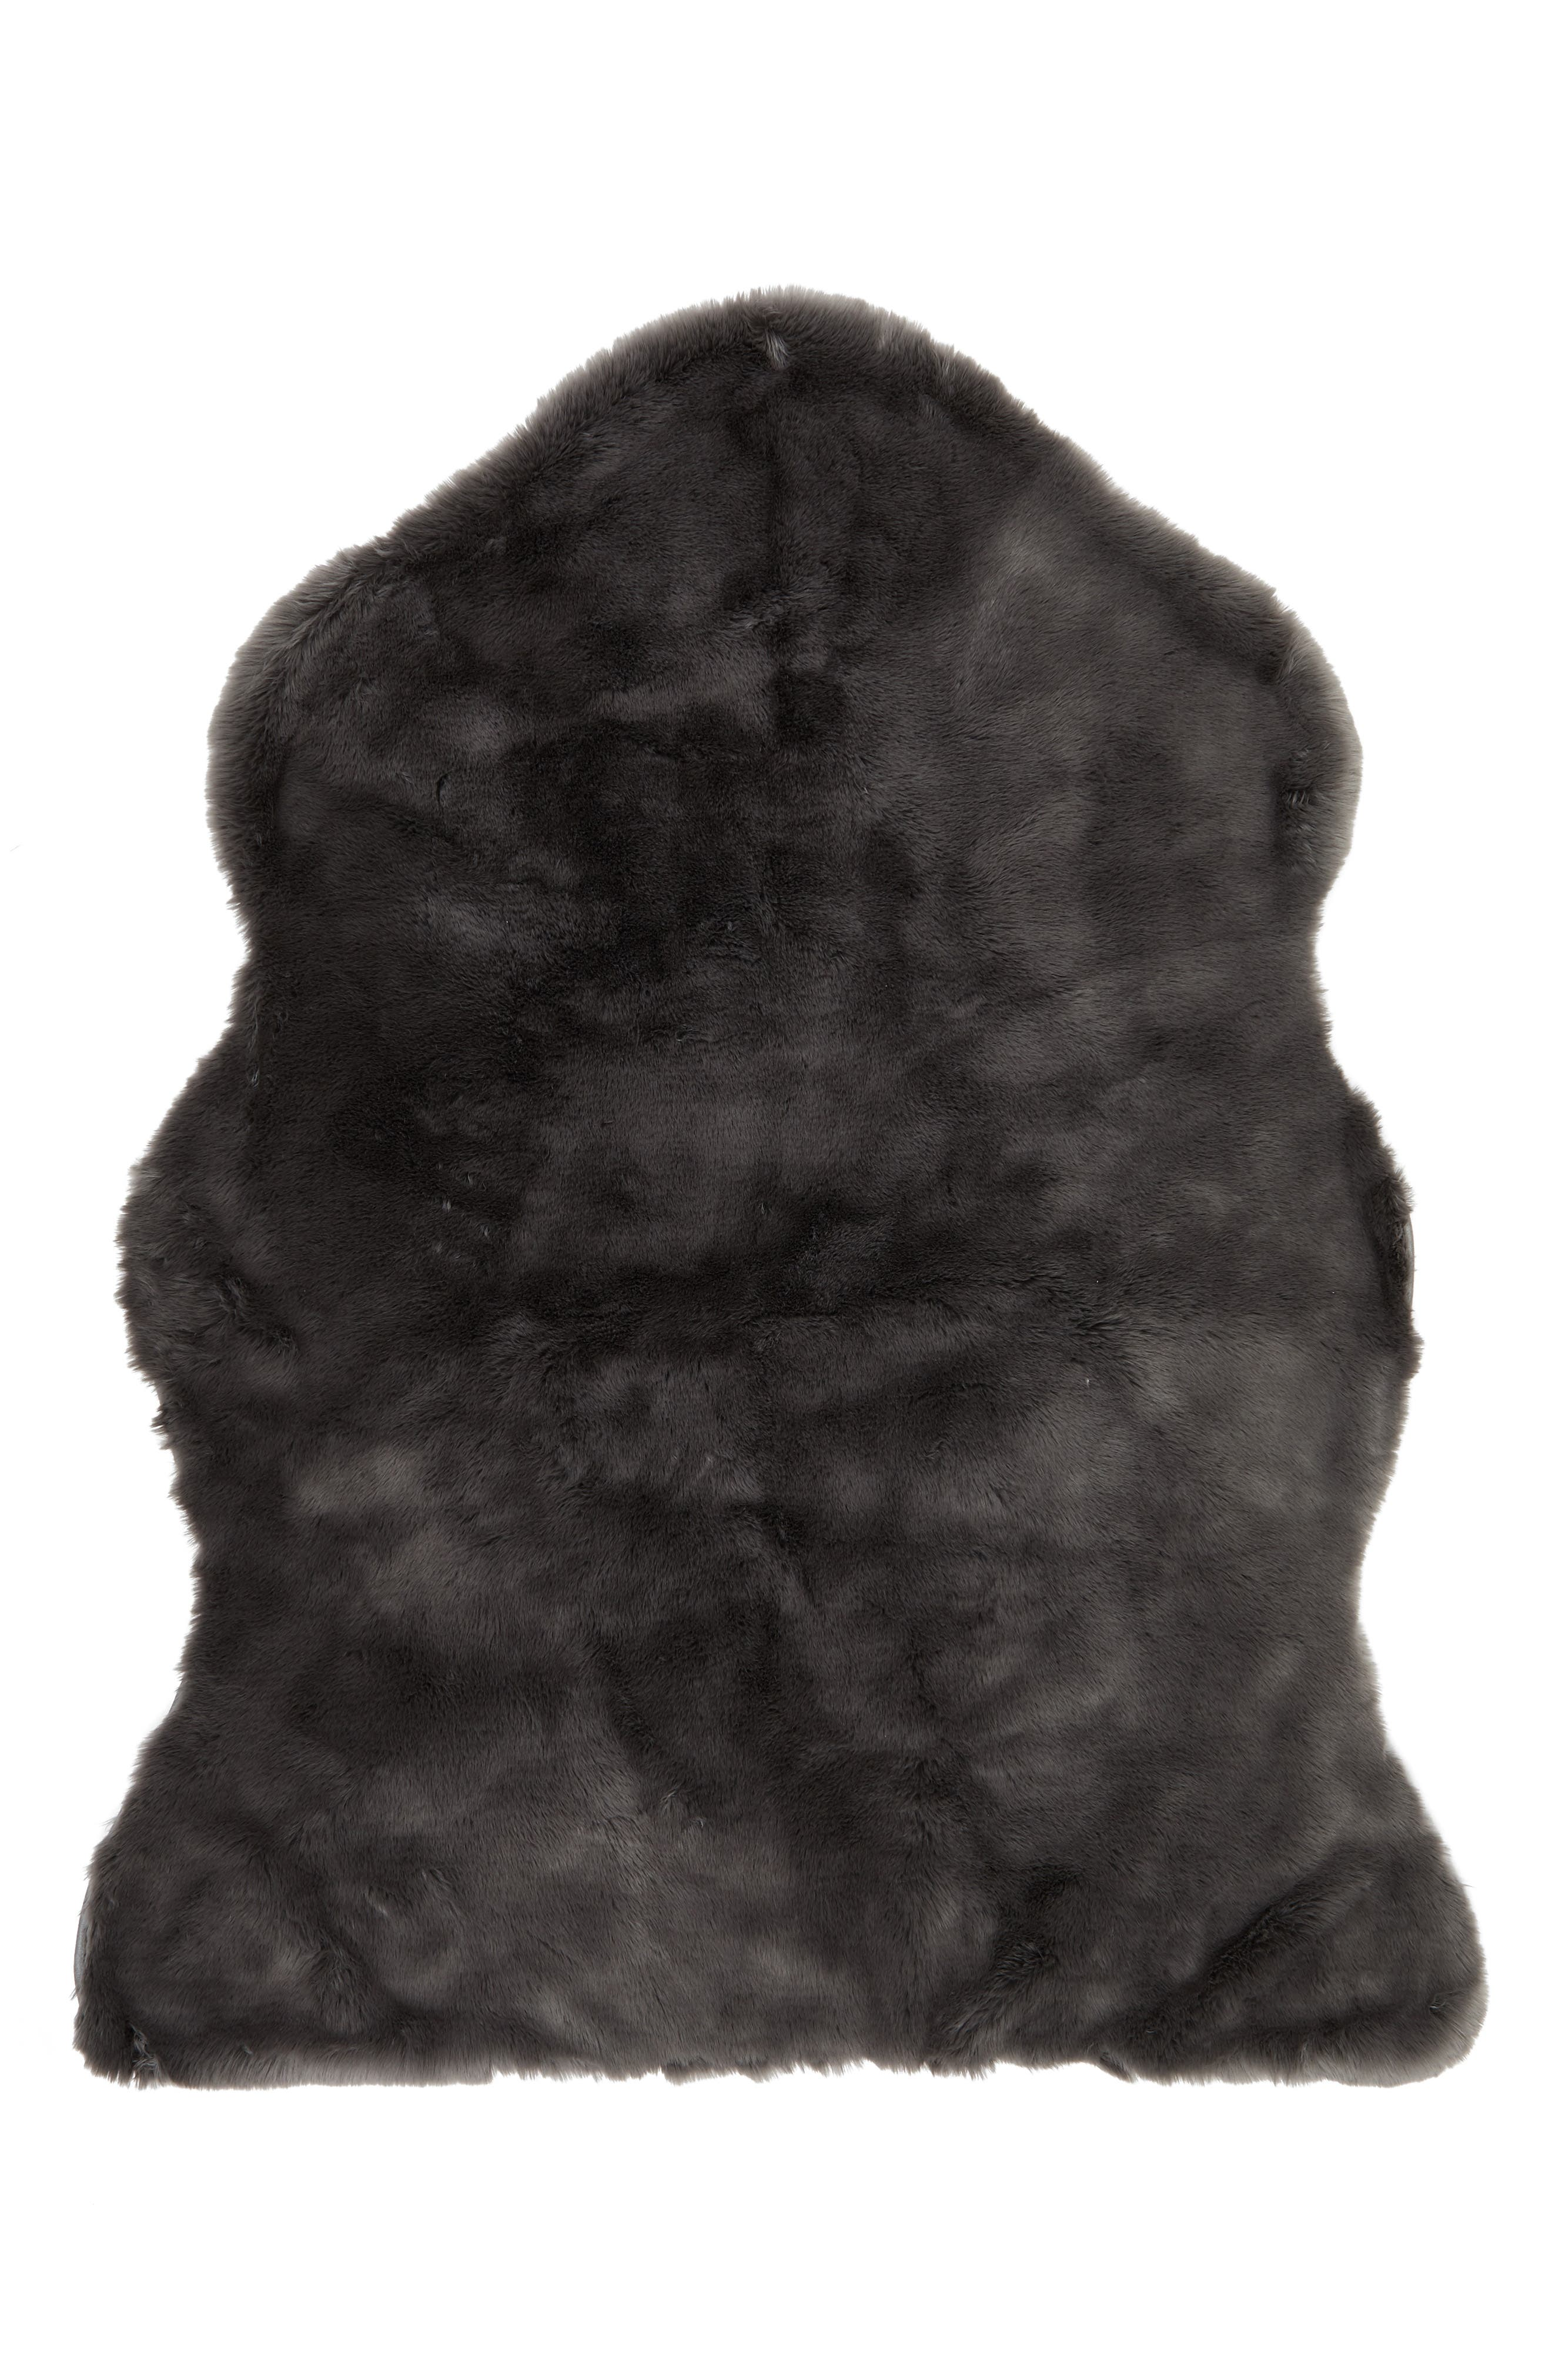 Cuddle Up Faux Fur Shaped Rug,                             Main thumbnail 1, color,                             021